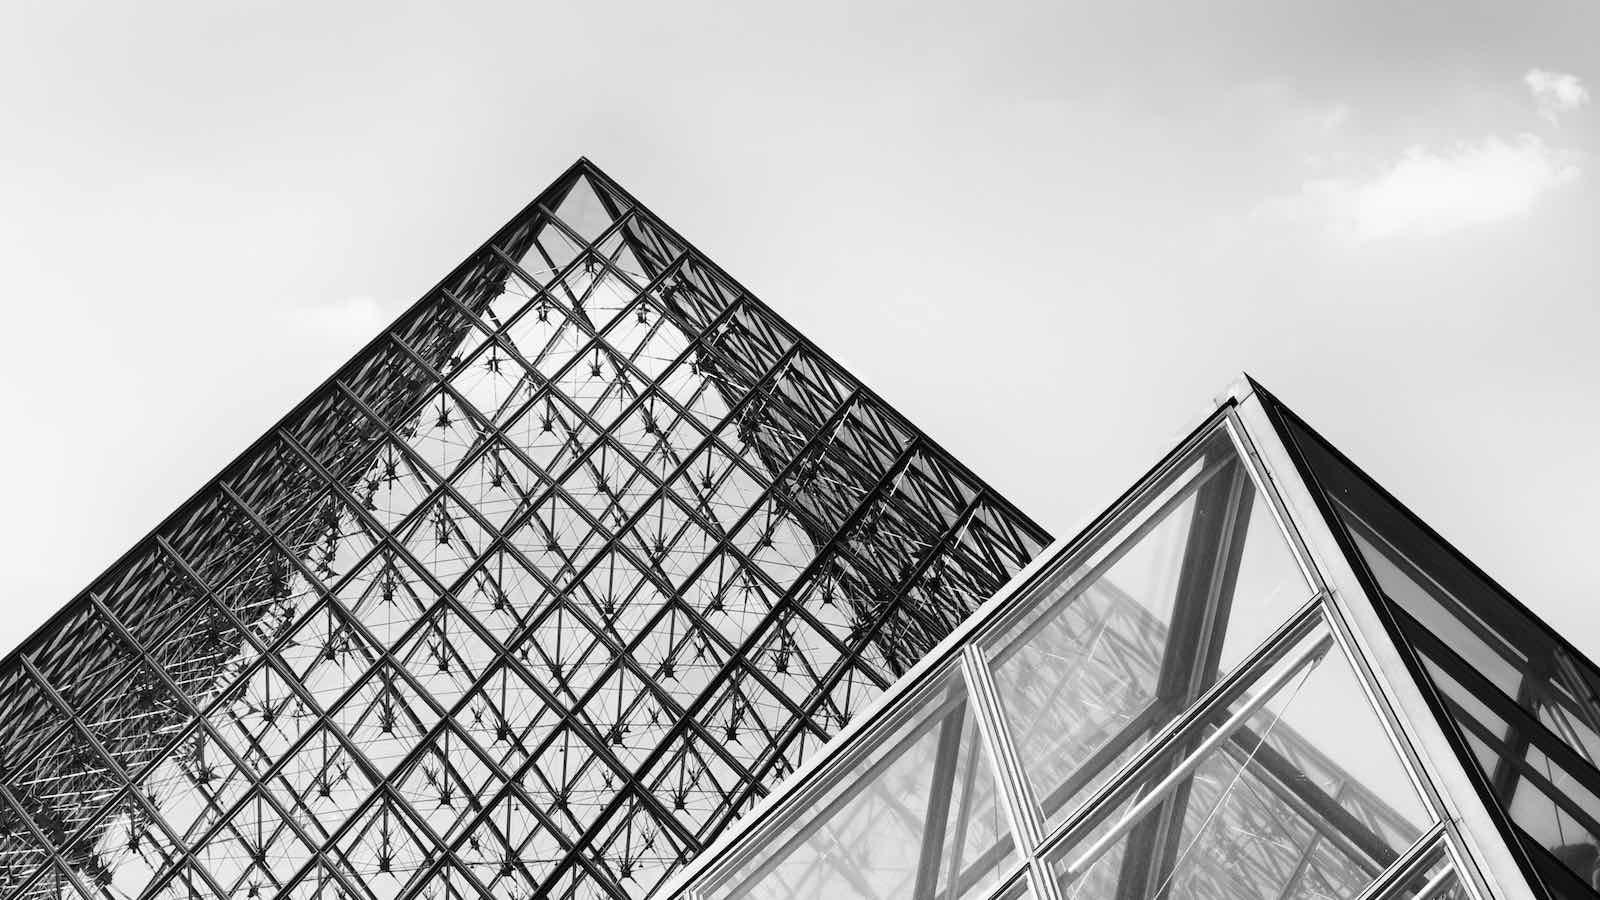 Paris: The taste of beauty